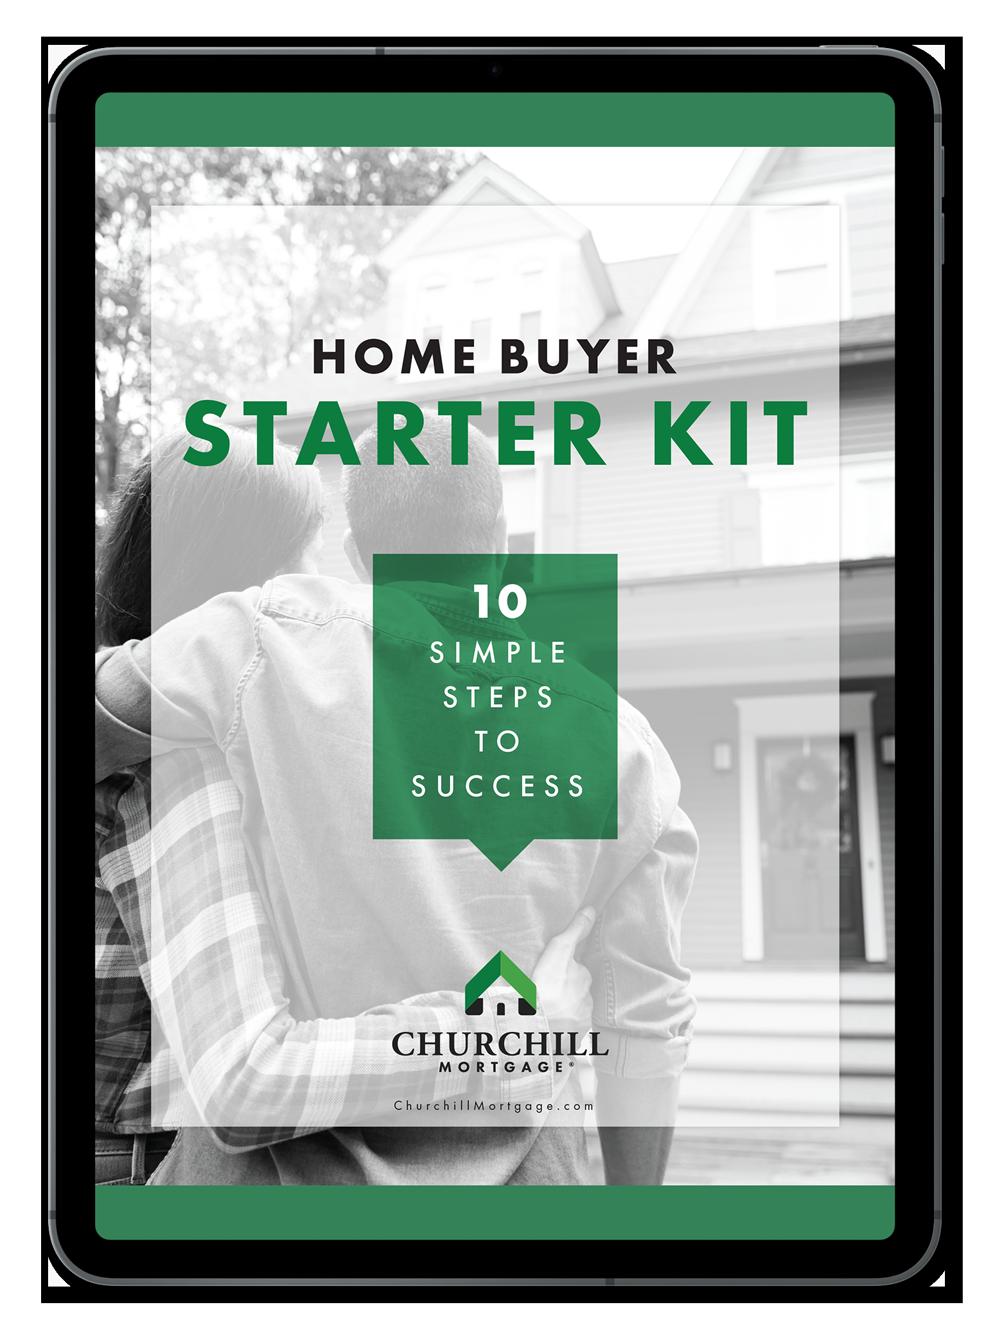 homebuyer-starter-kit-ebook-black-ipad-sm